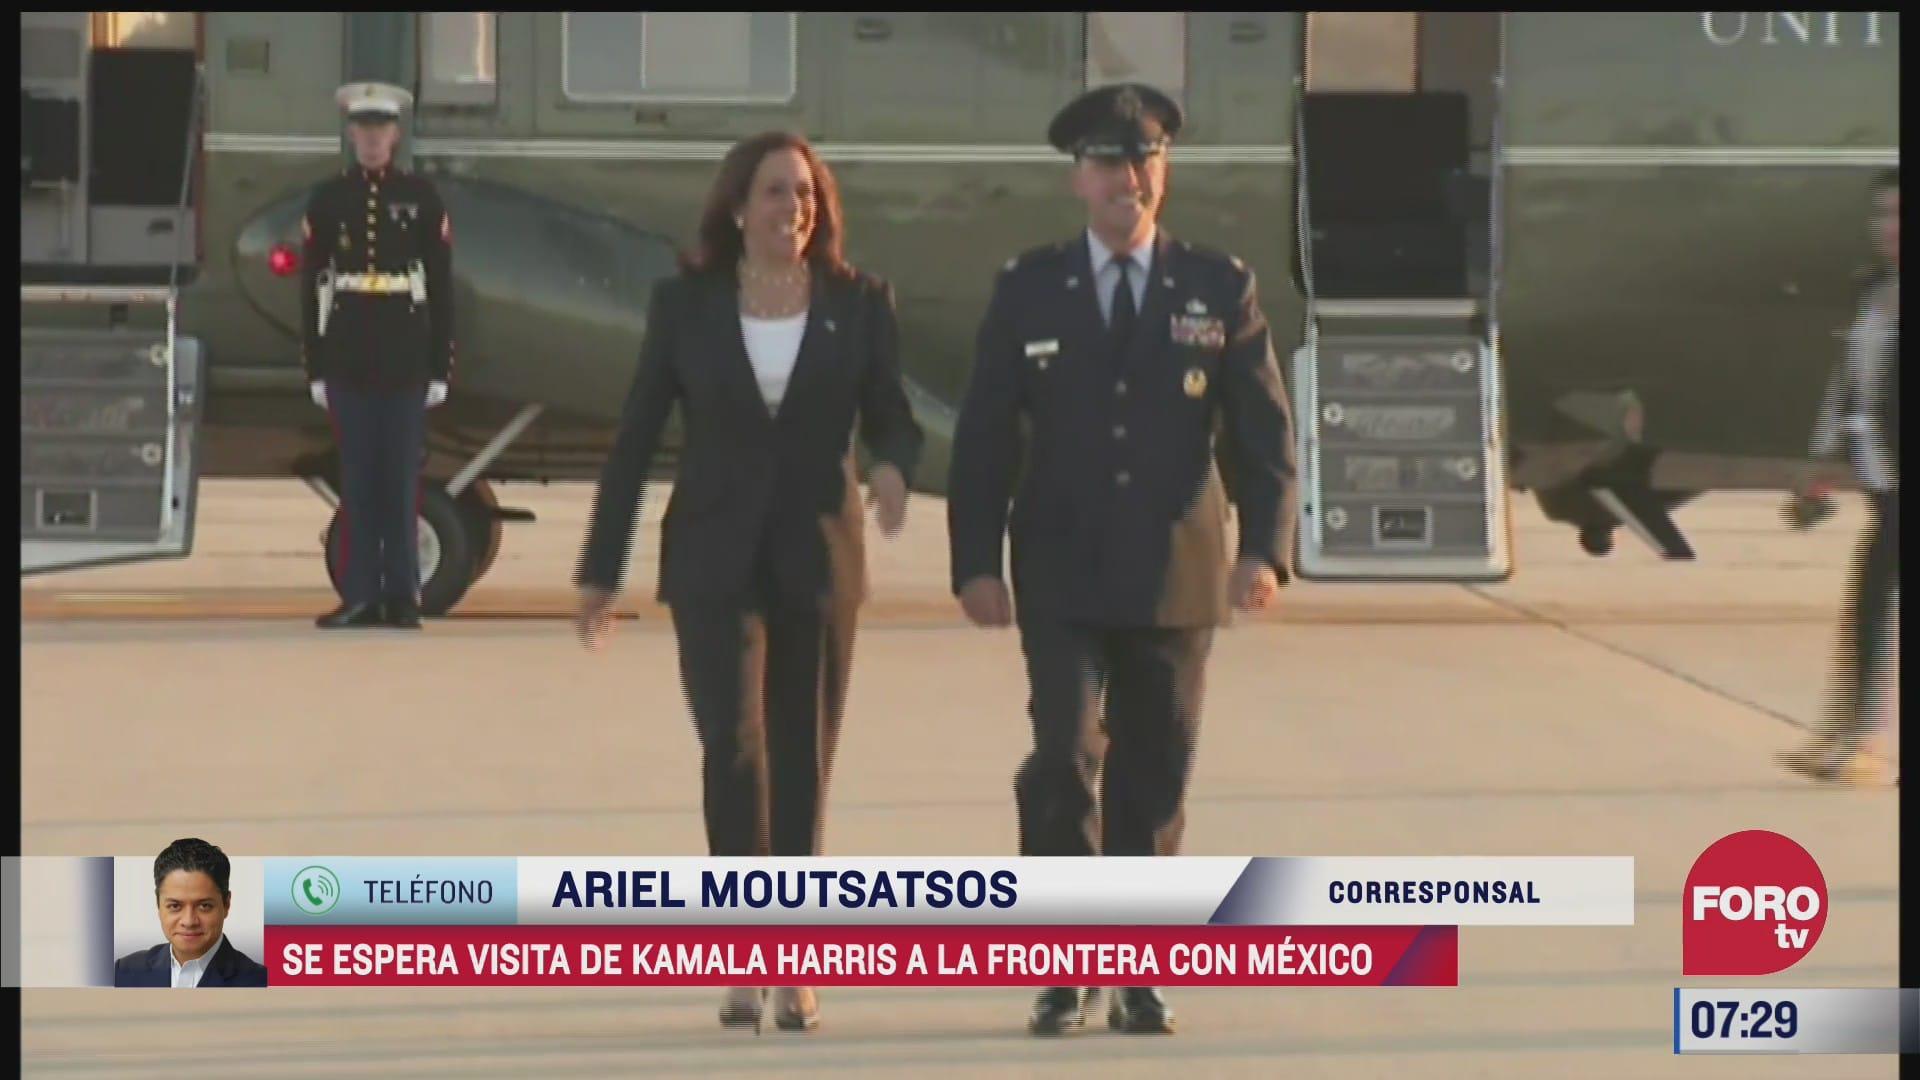 se espera visita de kamala harris a la frontera con mexico